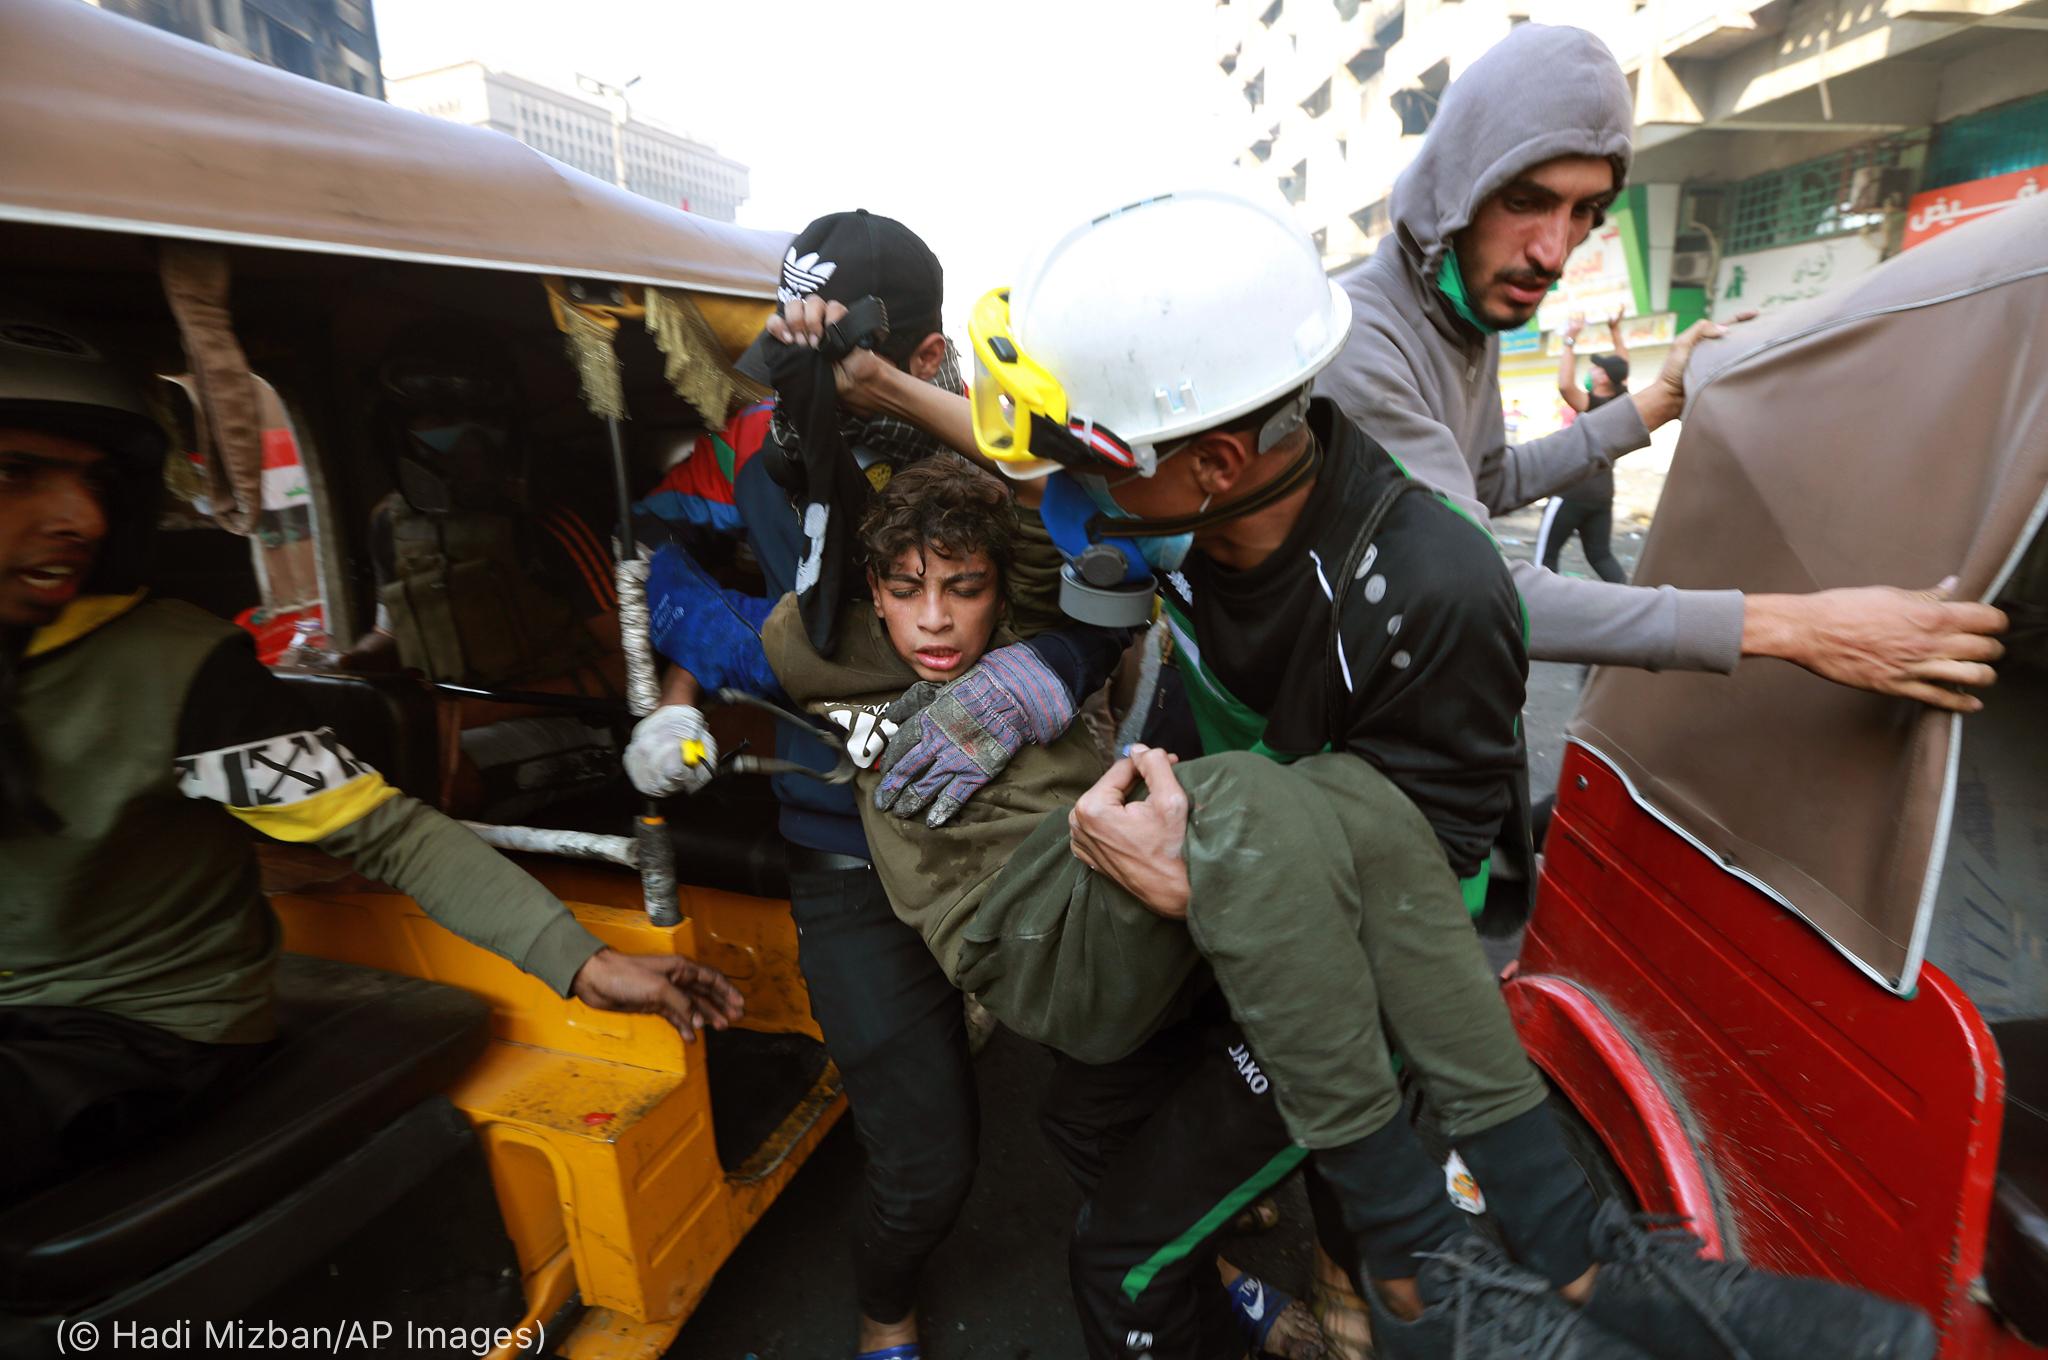 Homem carrega menino nos braços (© Hadi Mizban/AP Images)